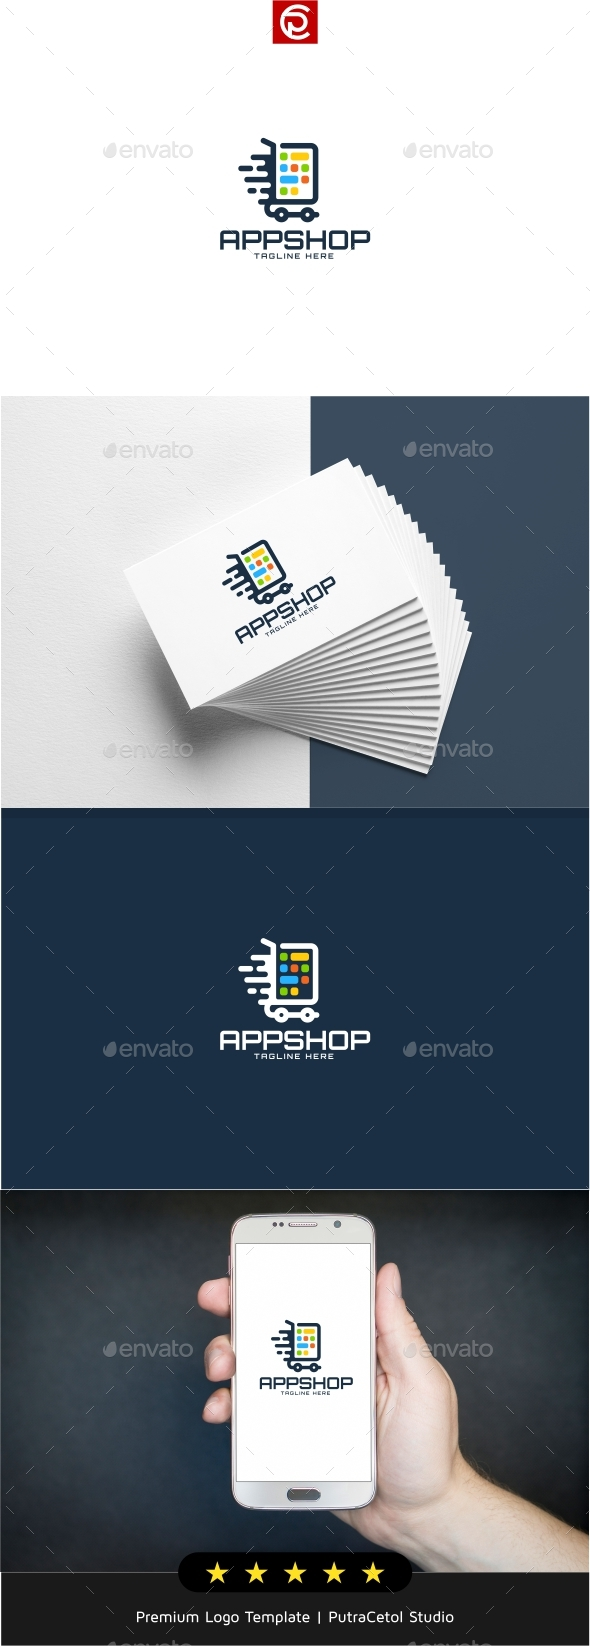 Apps Shop Logo